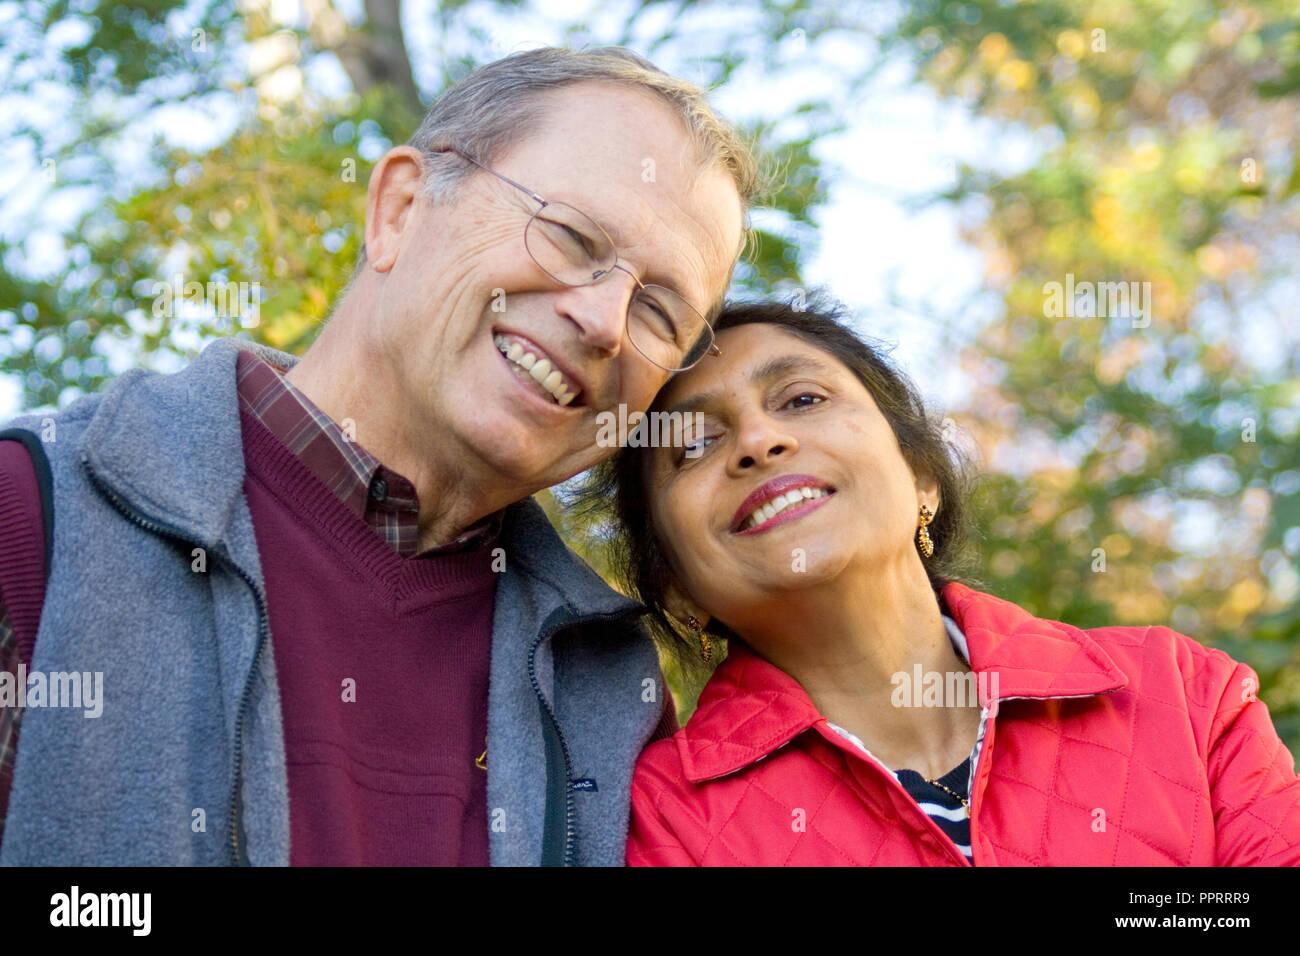 sposato dating India